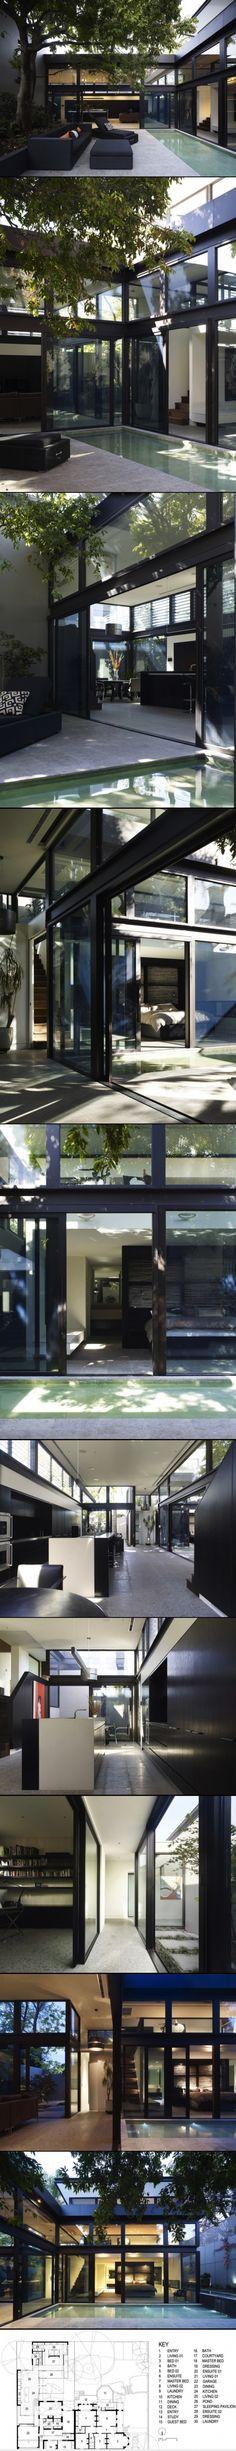 Harcourt Street by Steve Domoney Architecture